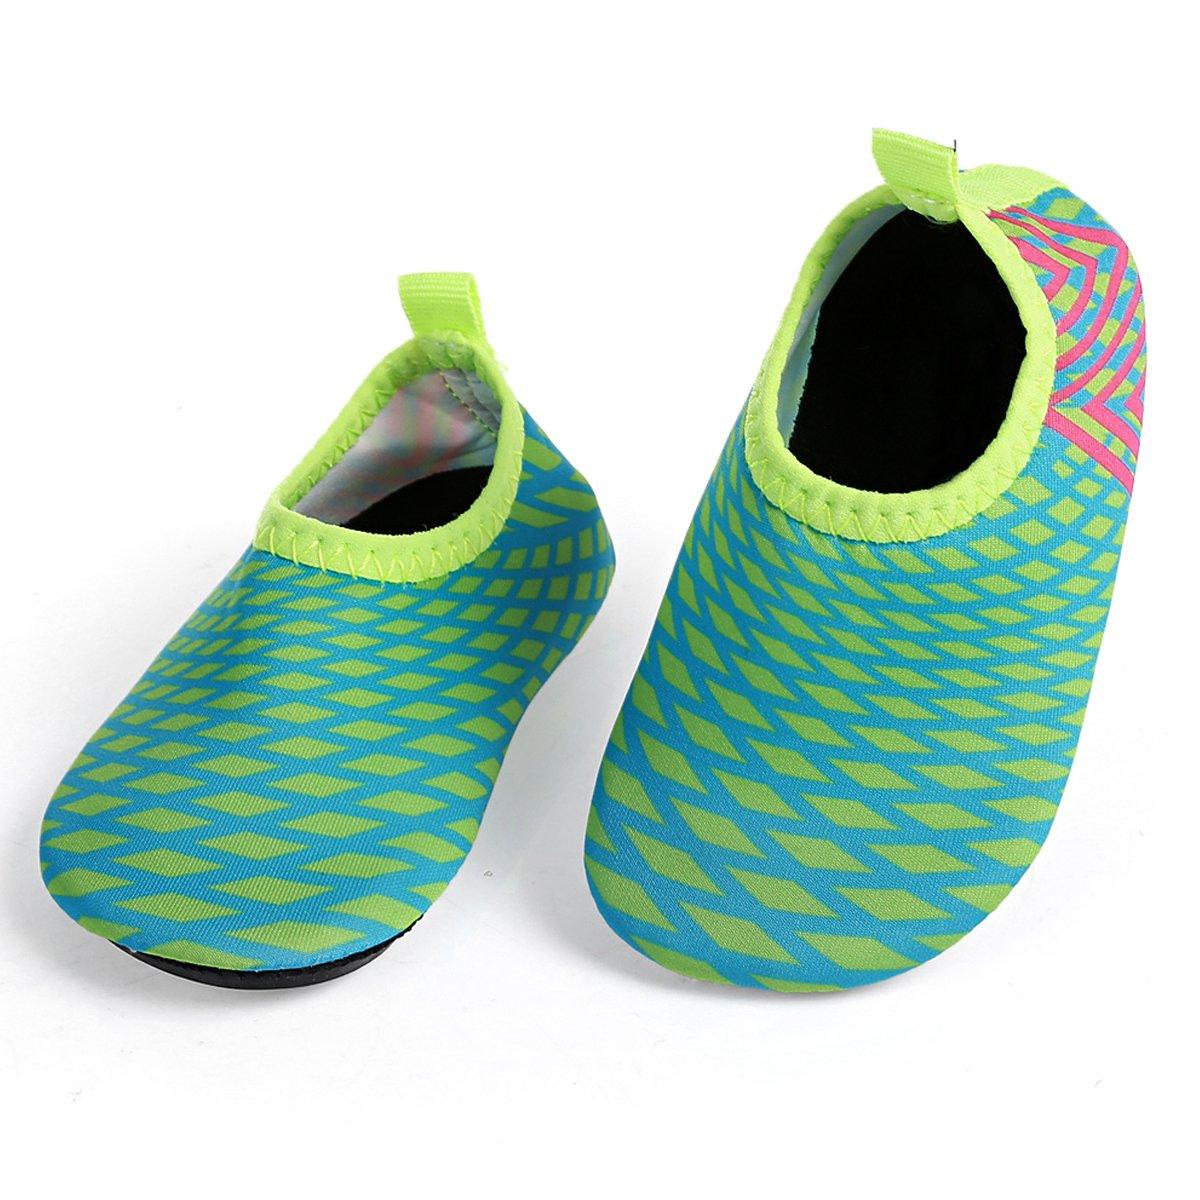 L-RUN Baby Water Shoes Barefoot Skin Aqua Sock Swim Shoes Beach Swim Pool L-RUN-LYE1-Black-19-20